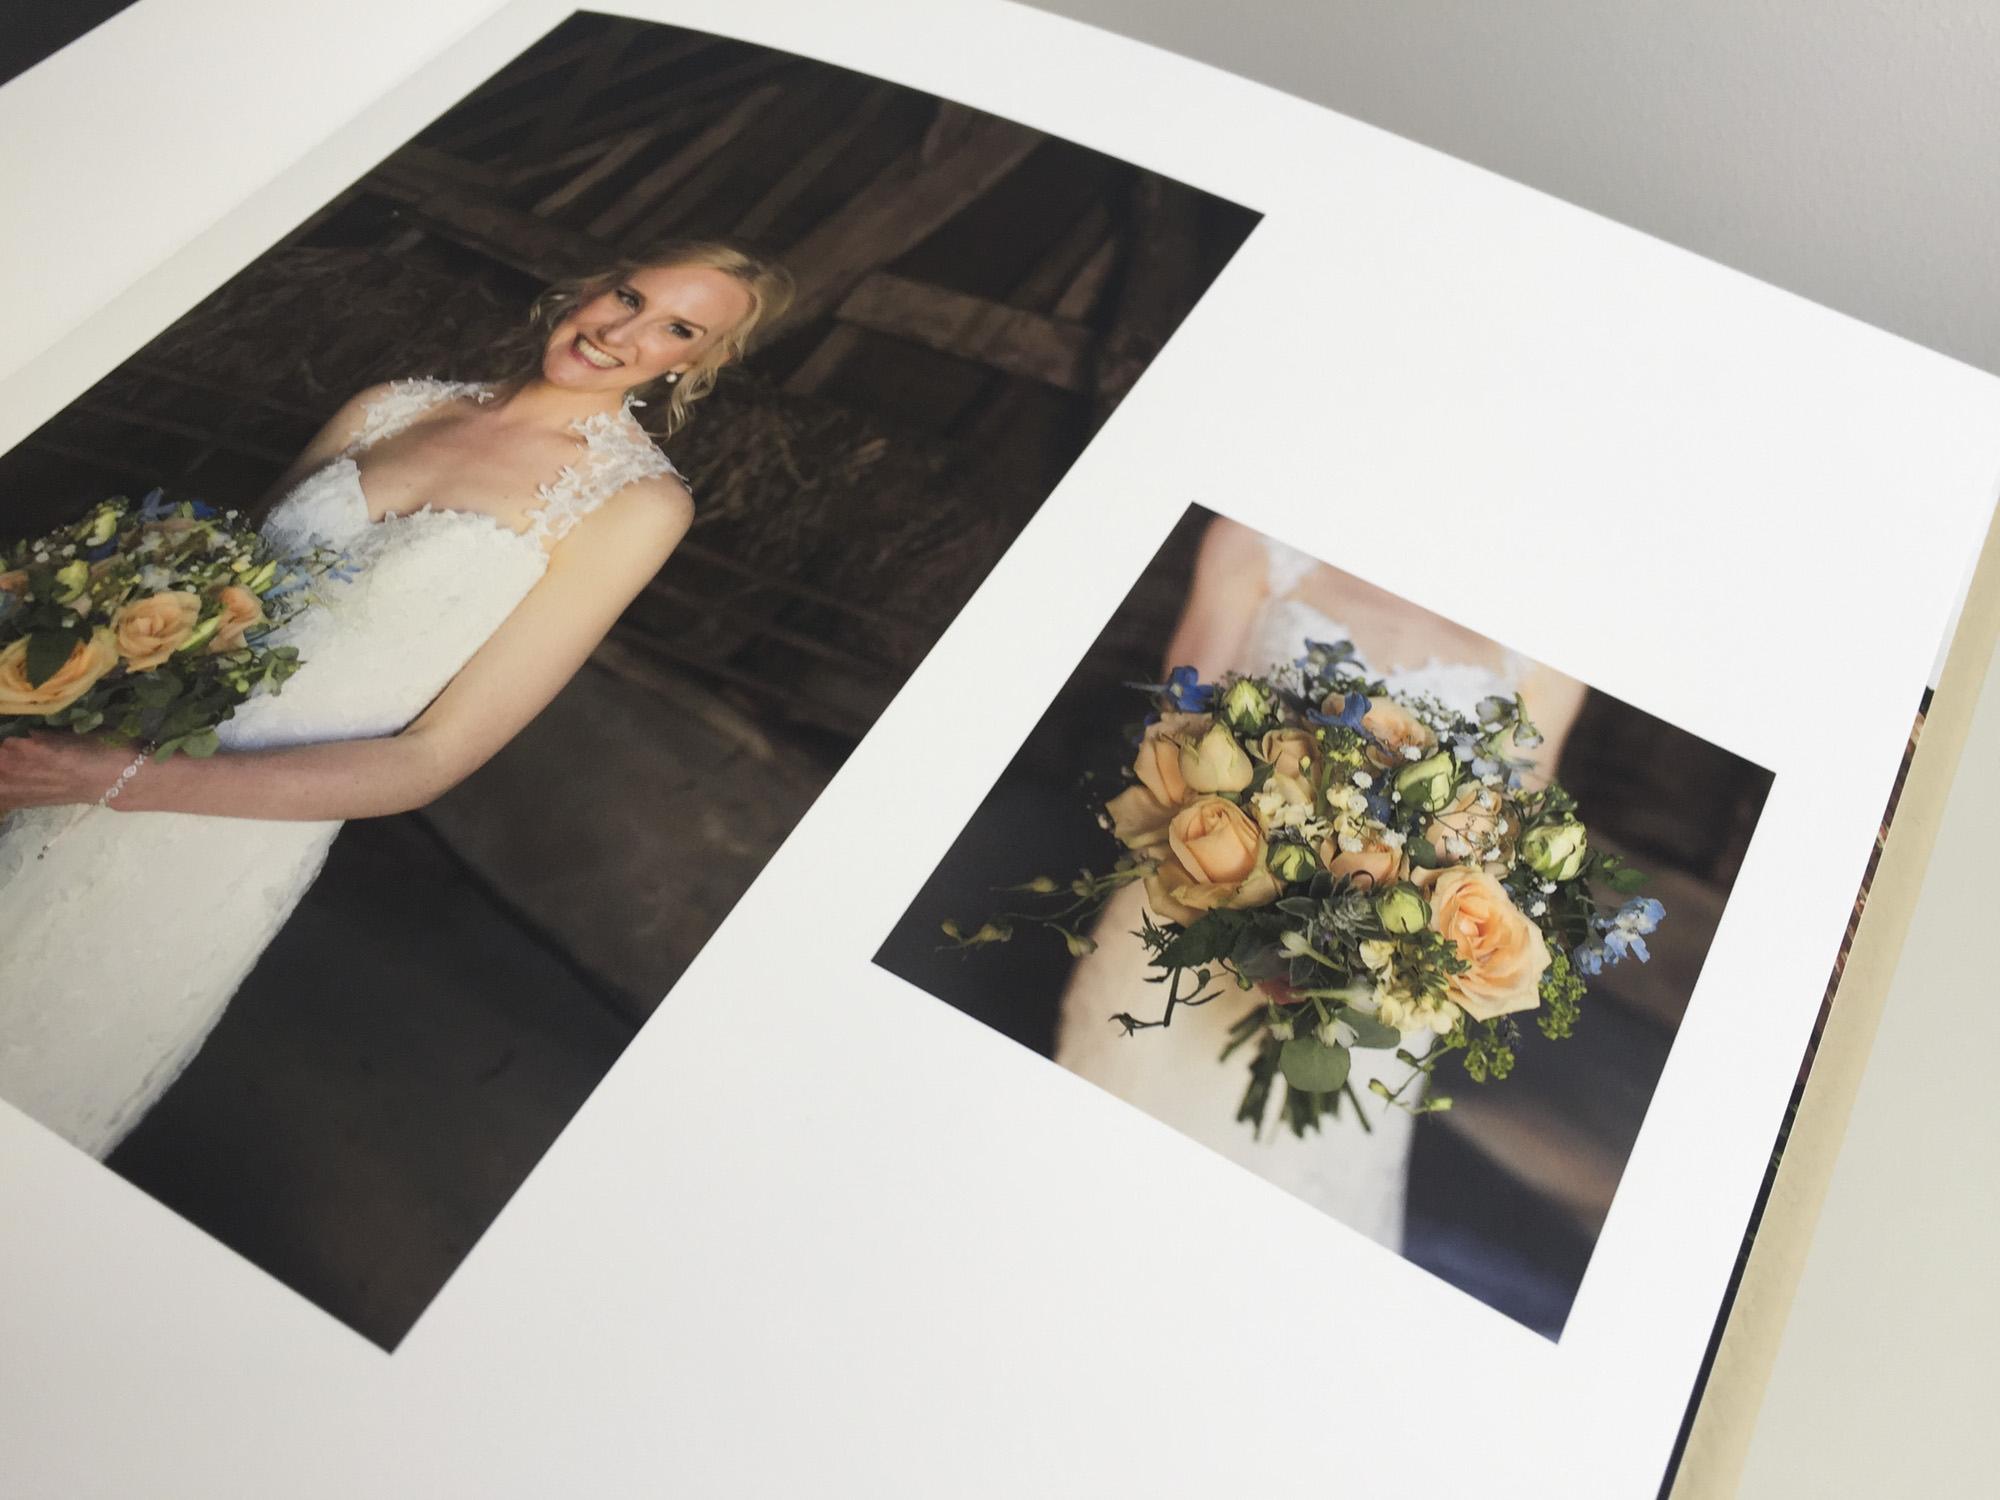 Wedding Photo Albums Cambridge, Cambridgeshire 22